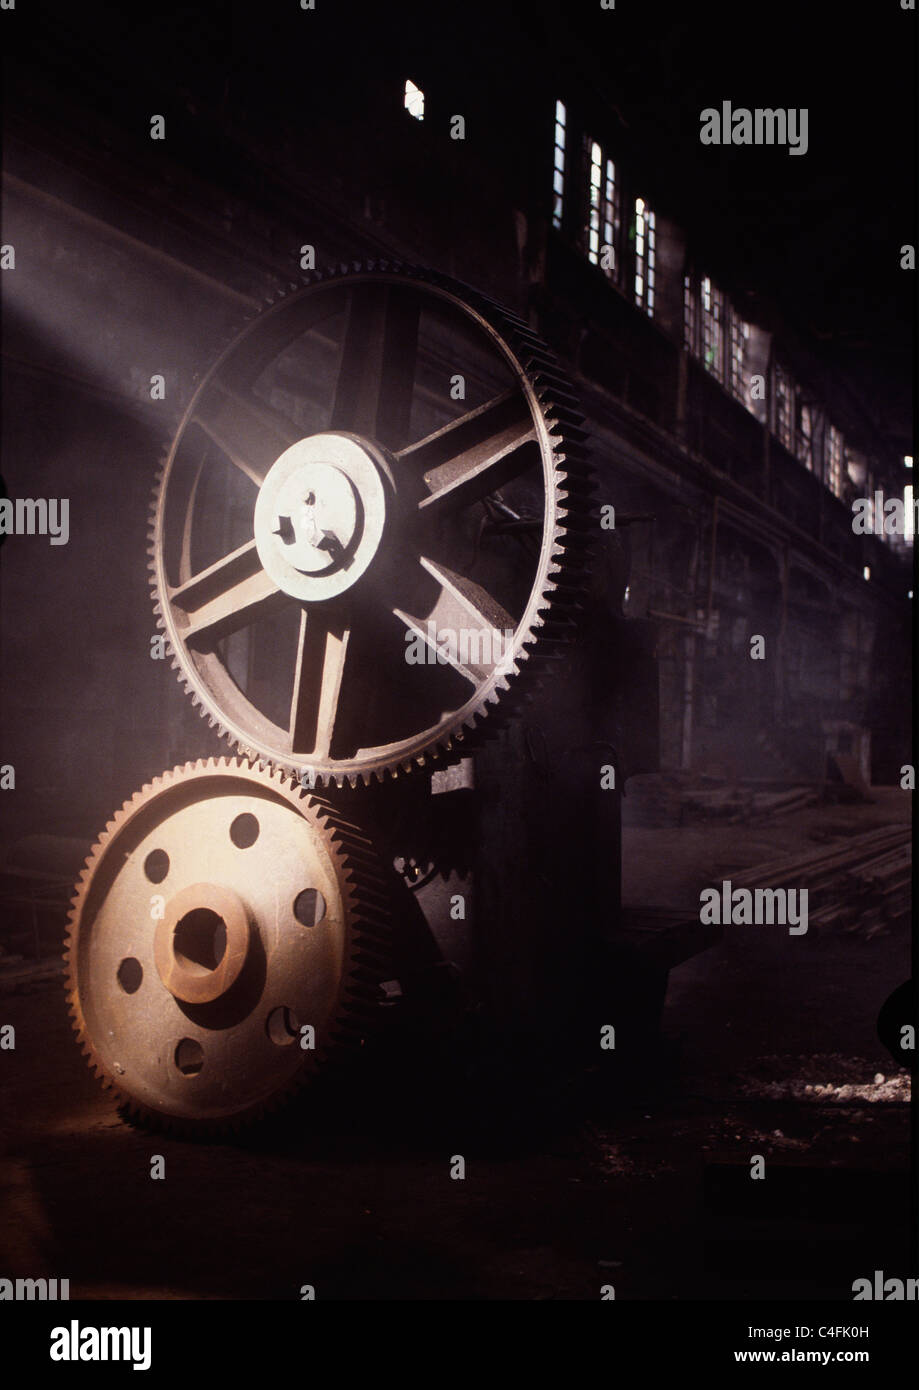 Gears - Stock Image